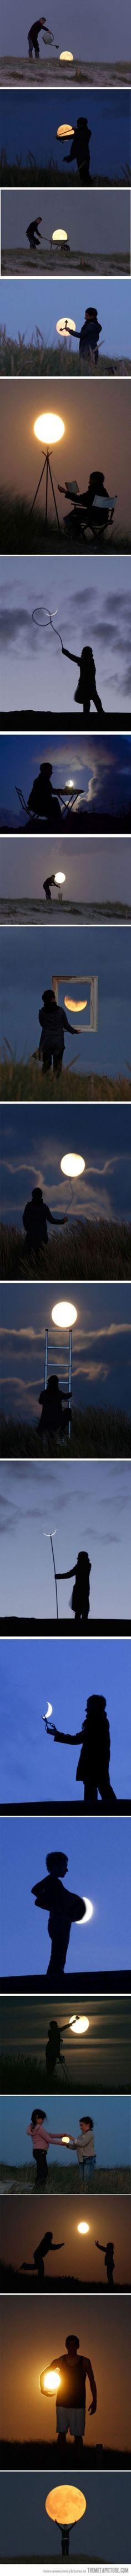 Great moon photos